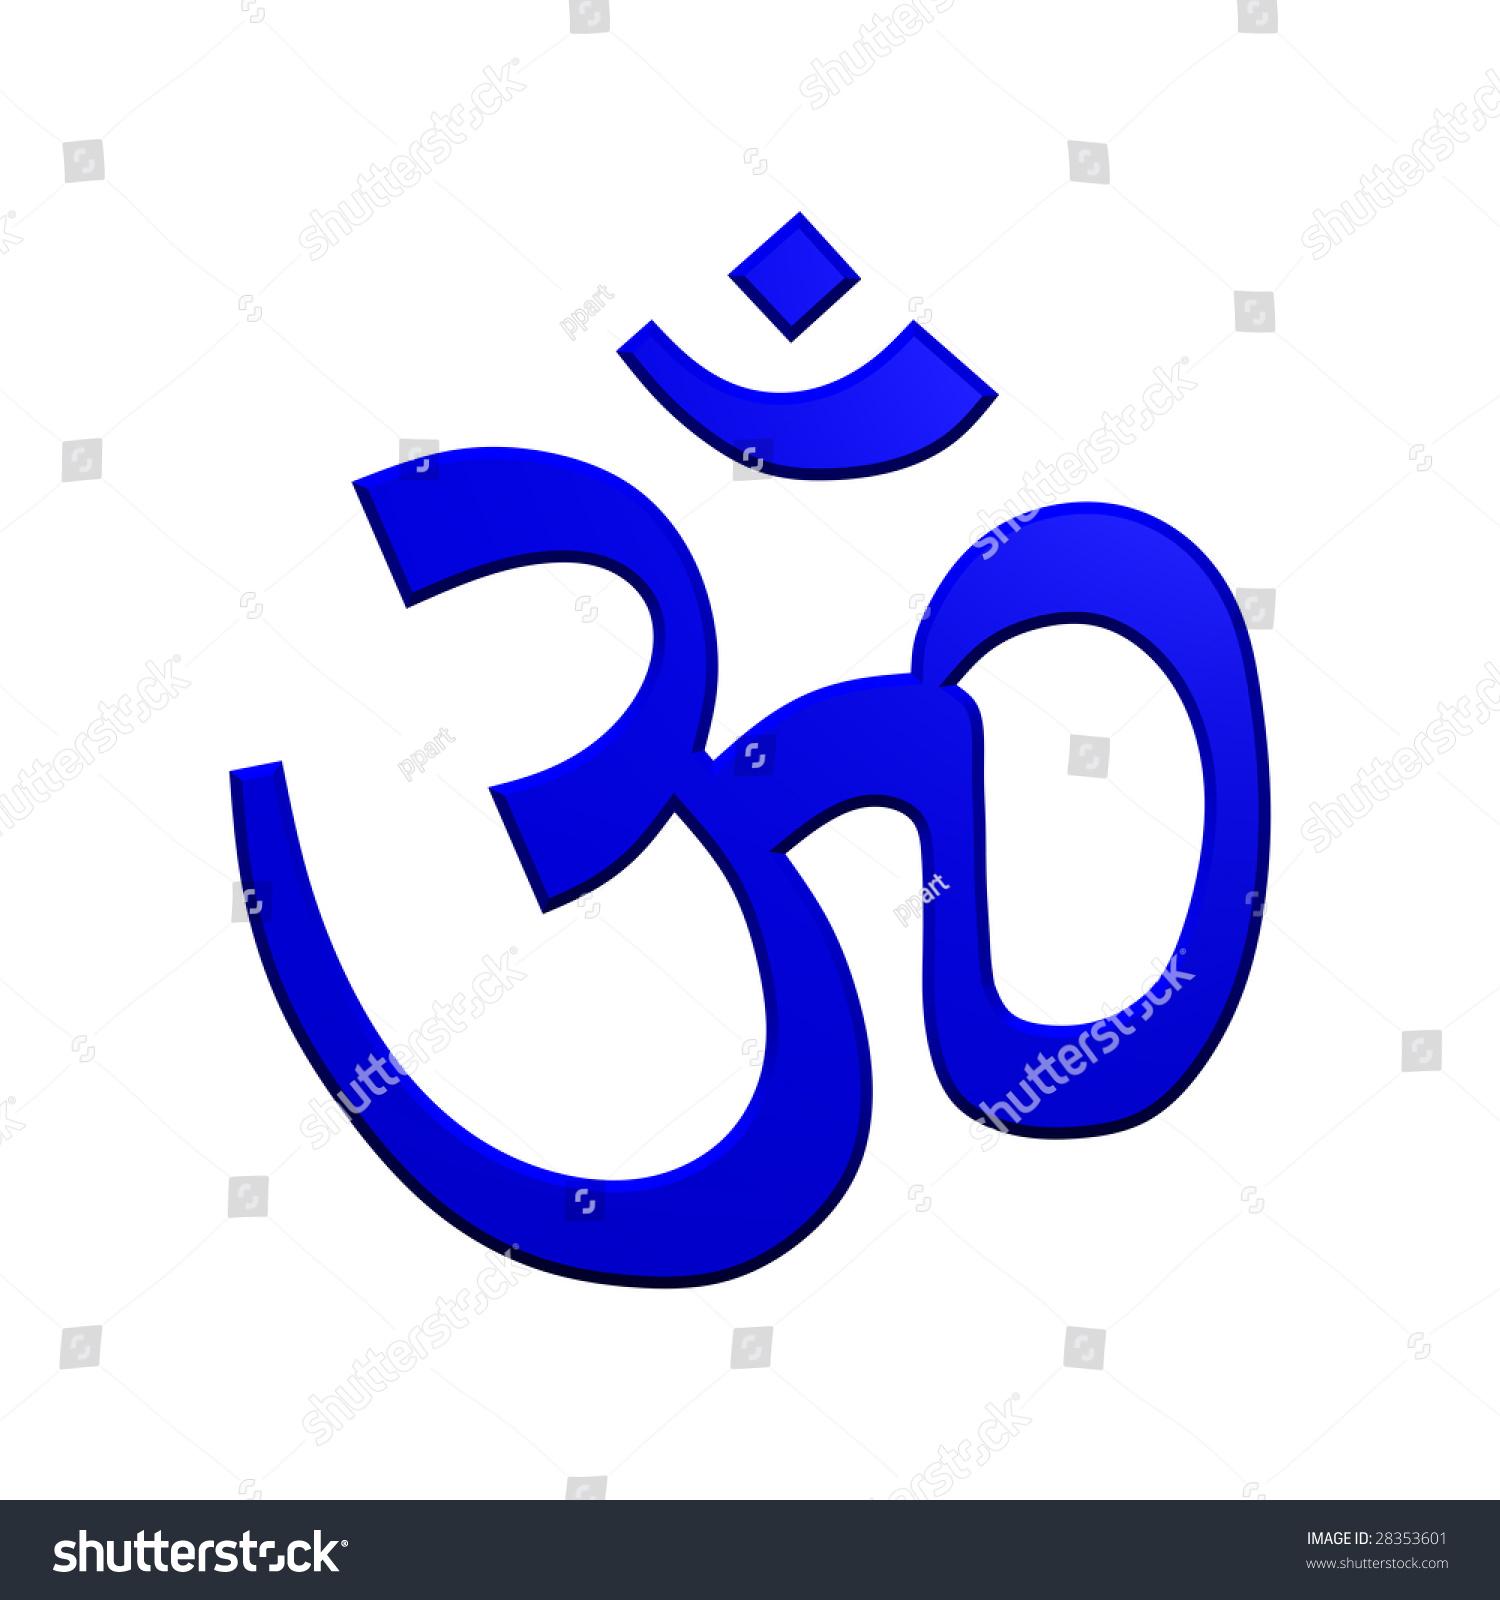 Blue hinduism symbol computer generated 3d stock illustration blue hinduism symbol computer generated 3d photo rendering biocorpaavc